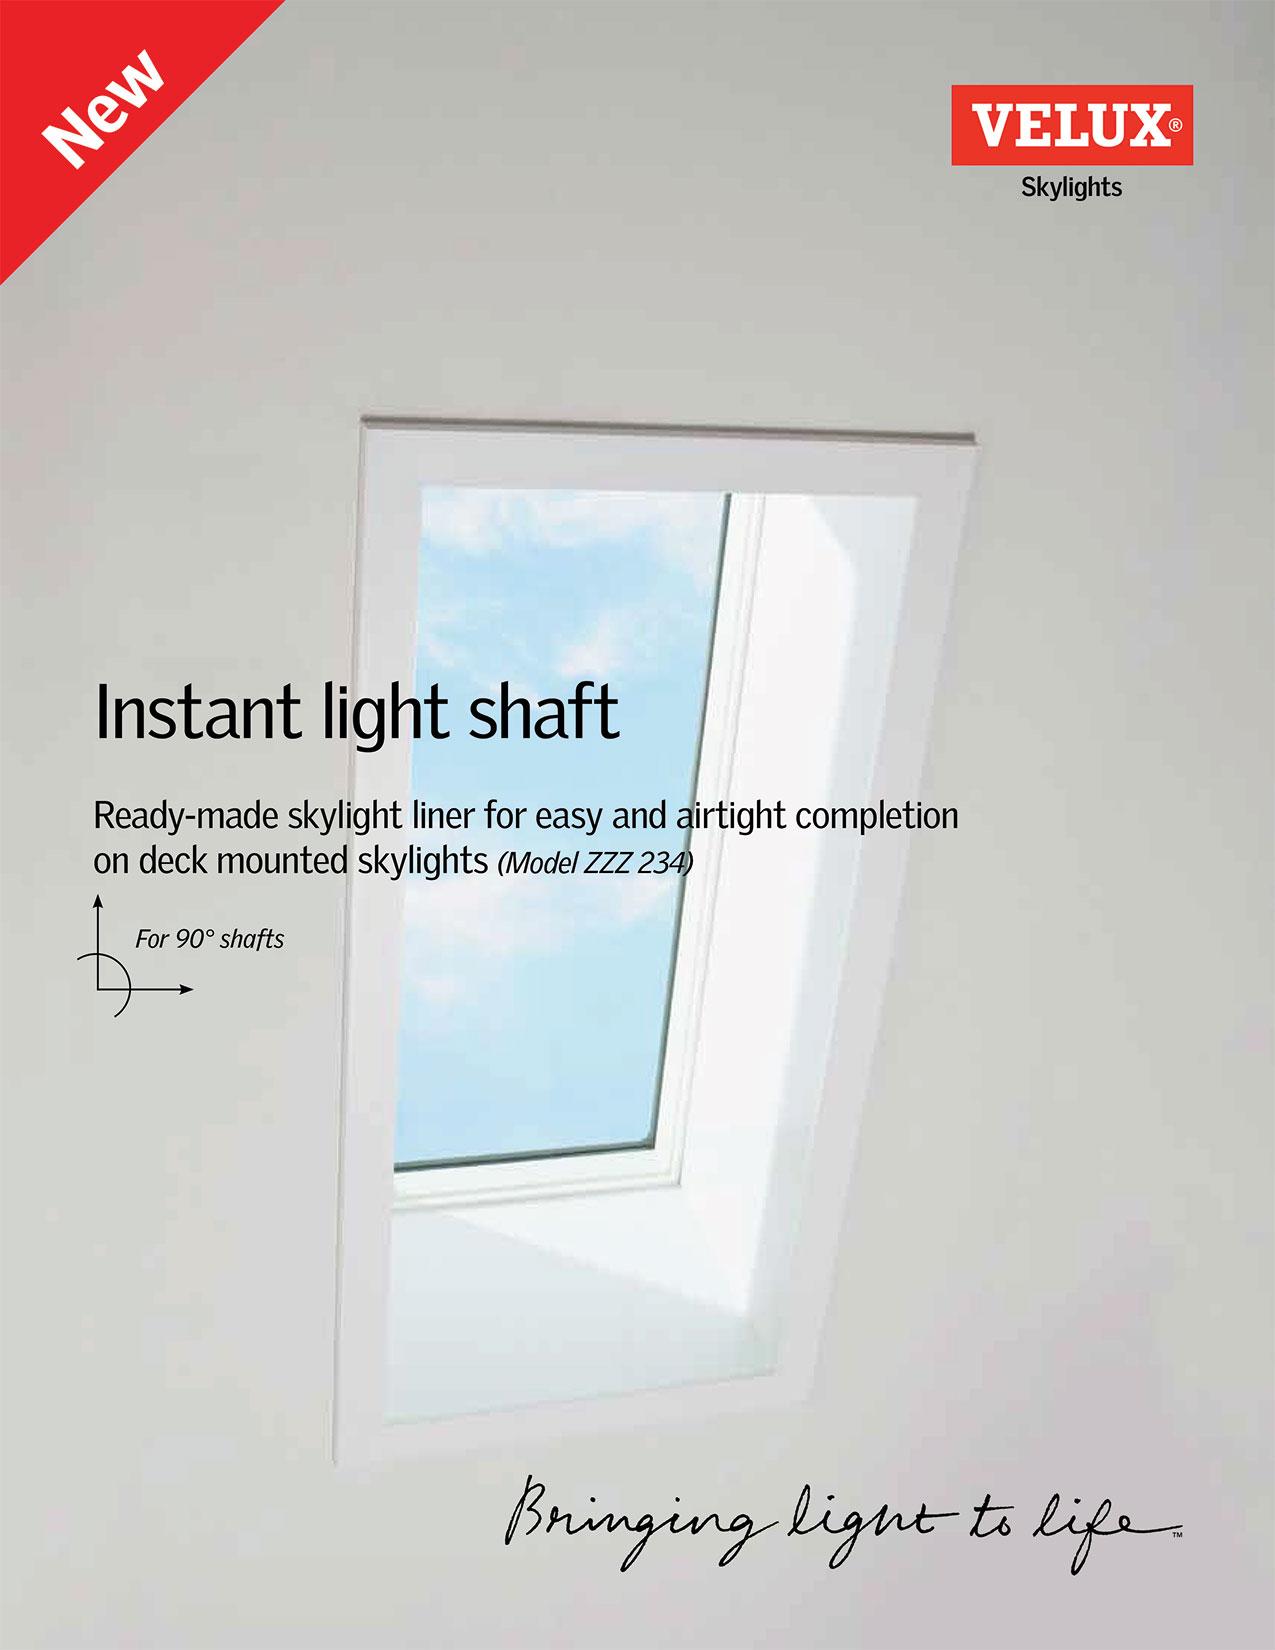 Flyer on instant light shaft